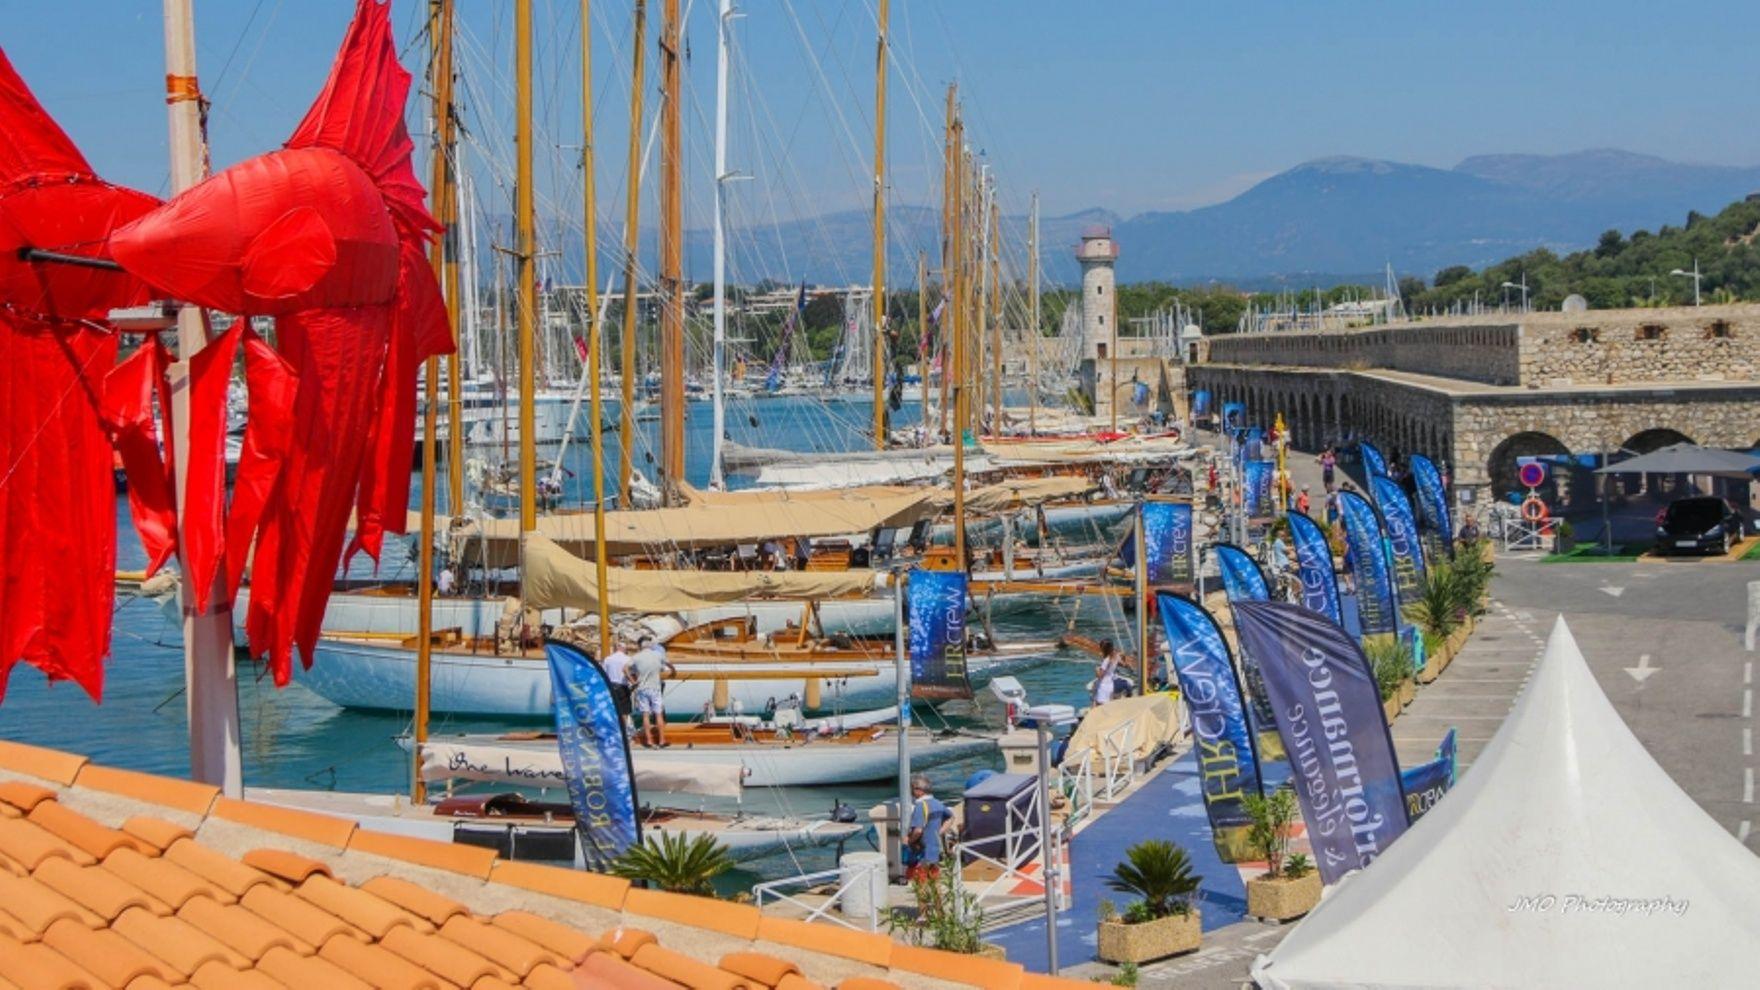 Les Voiles d'Antibes 2021 regatta